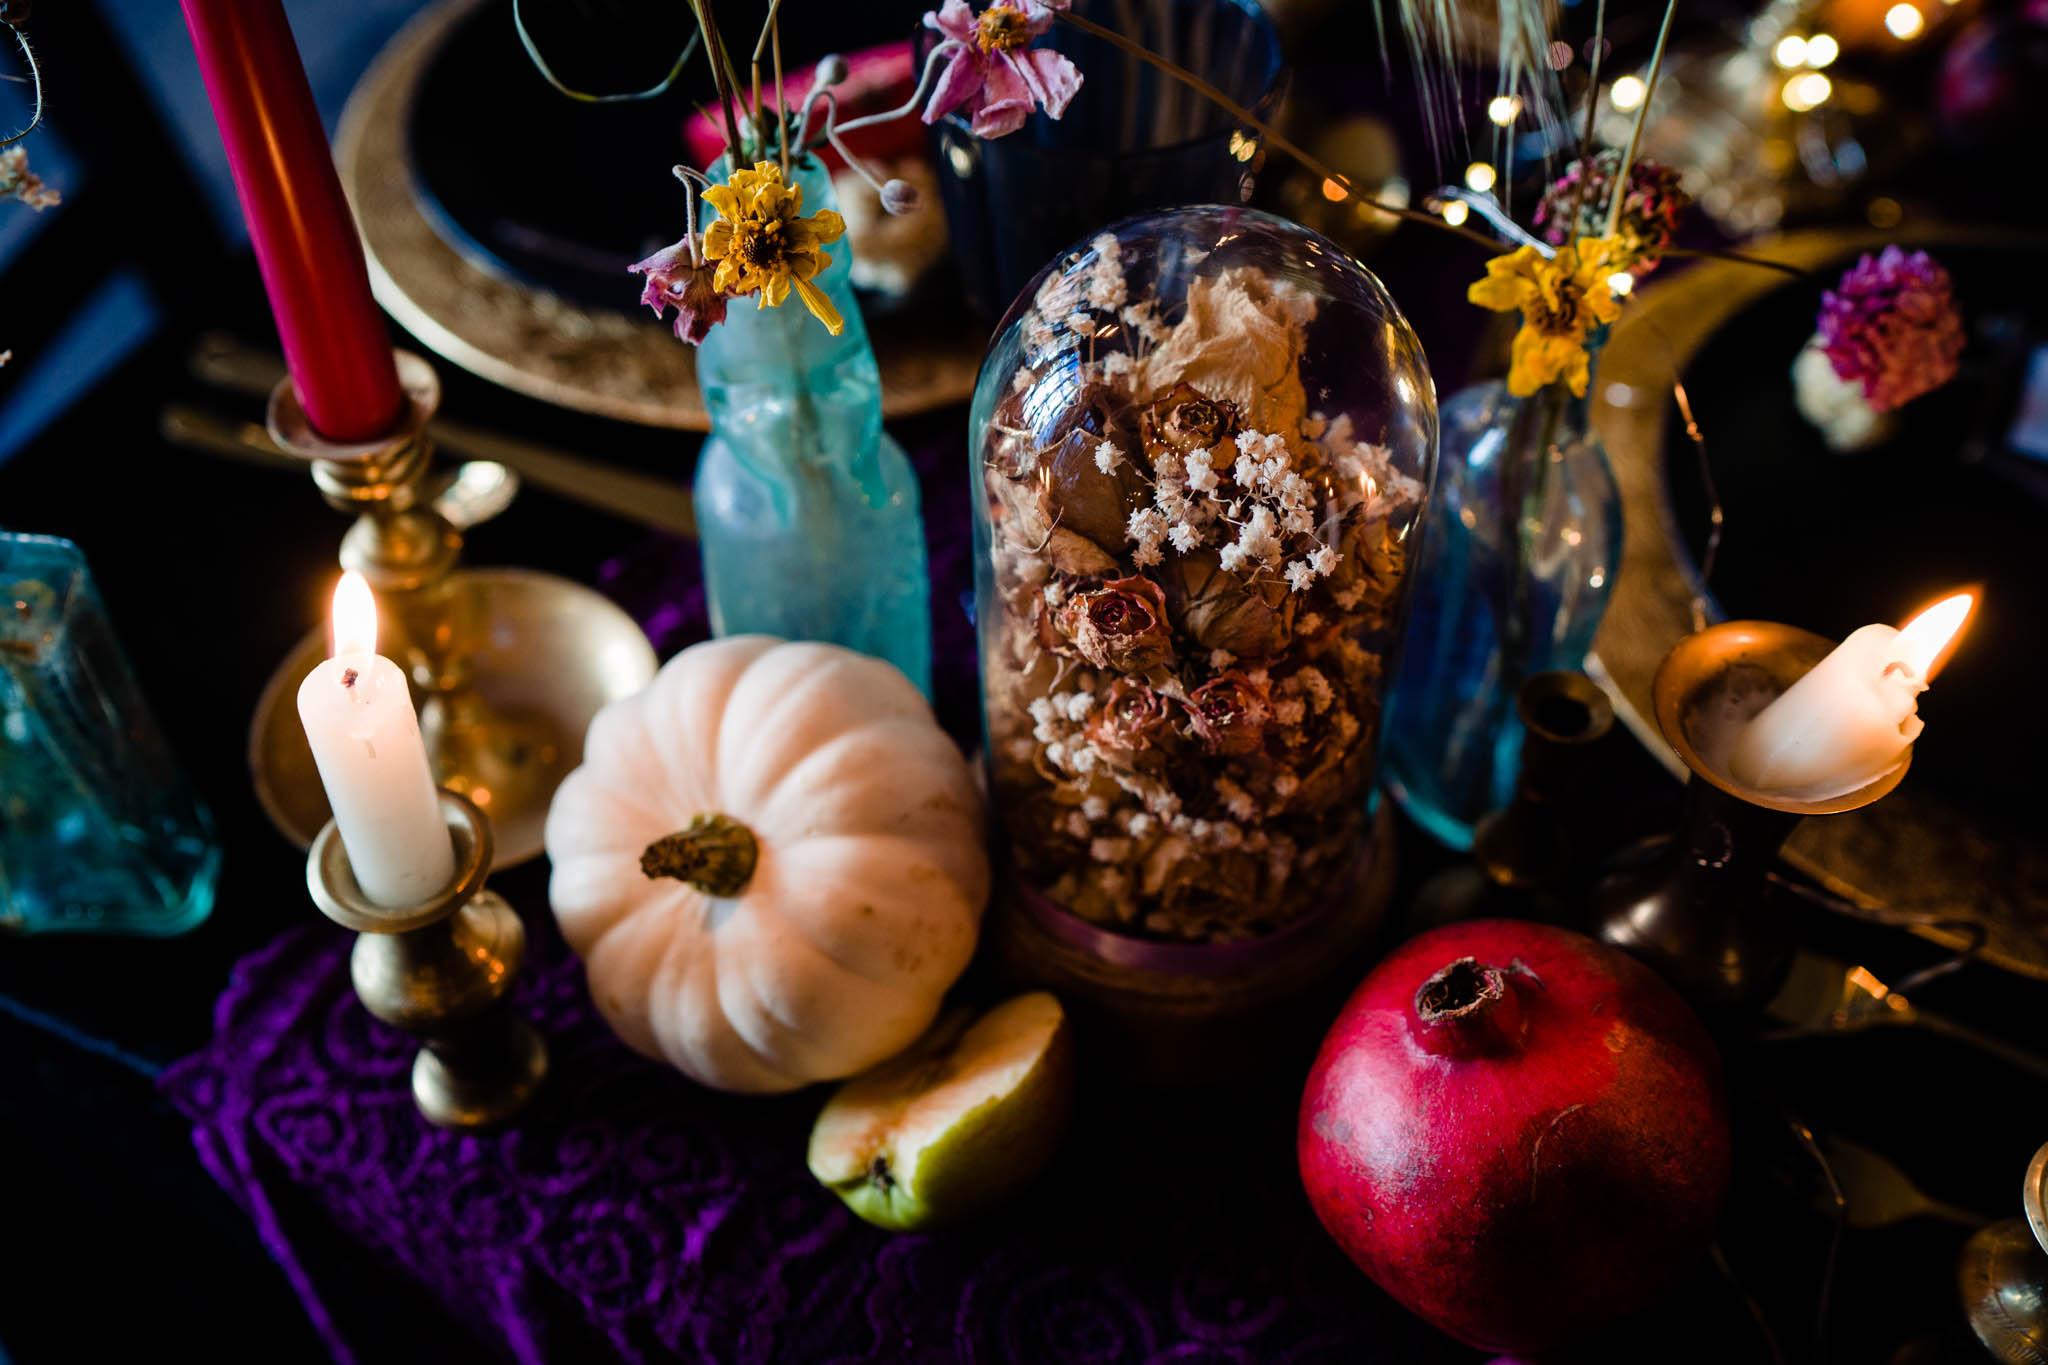 colourful autumn wedding decor - pumpkin wedding - eclectic wedding table decorations